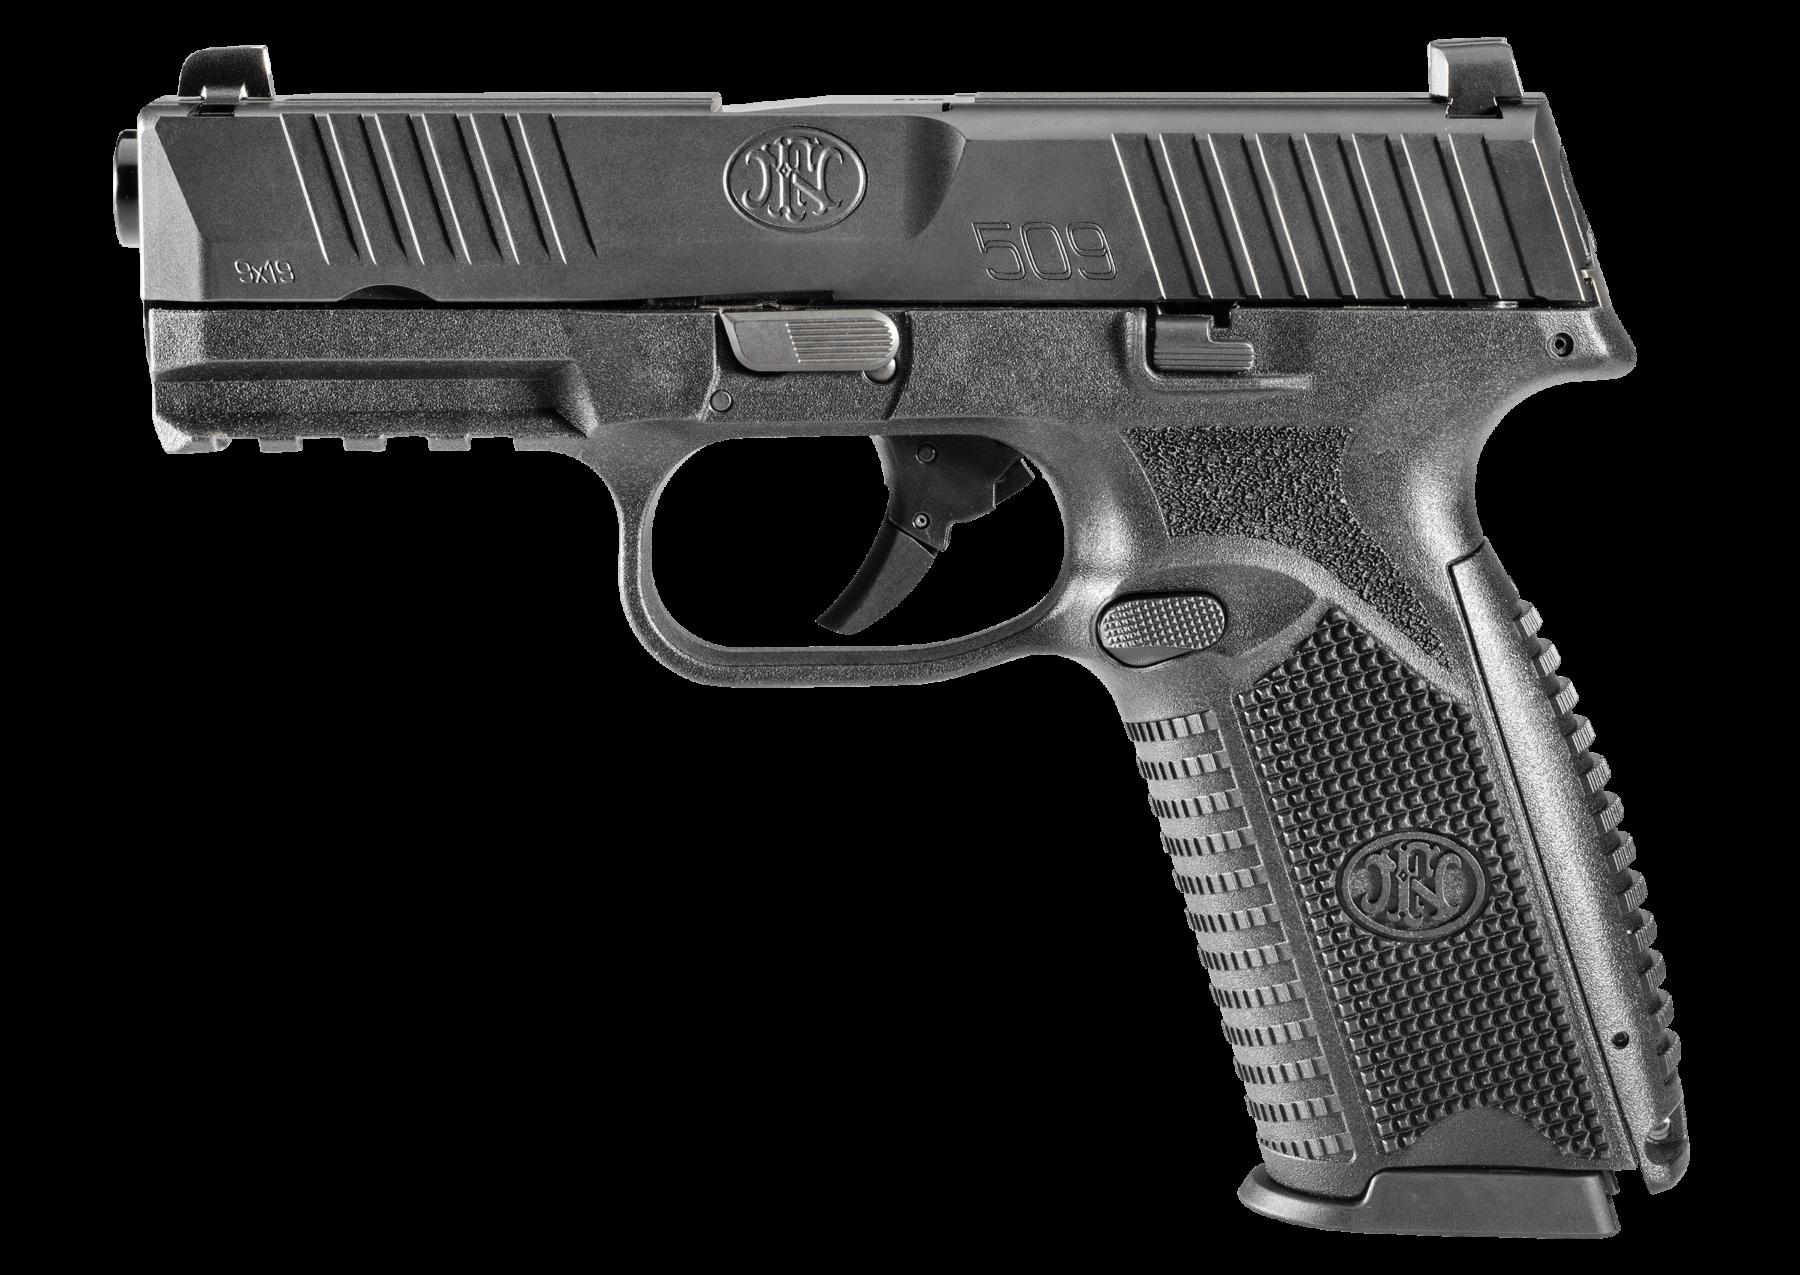 Firearm pistol shooting range. Clipart gun magnum